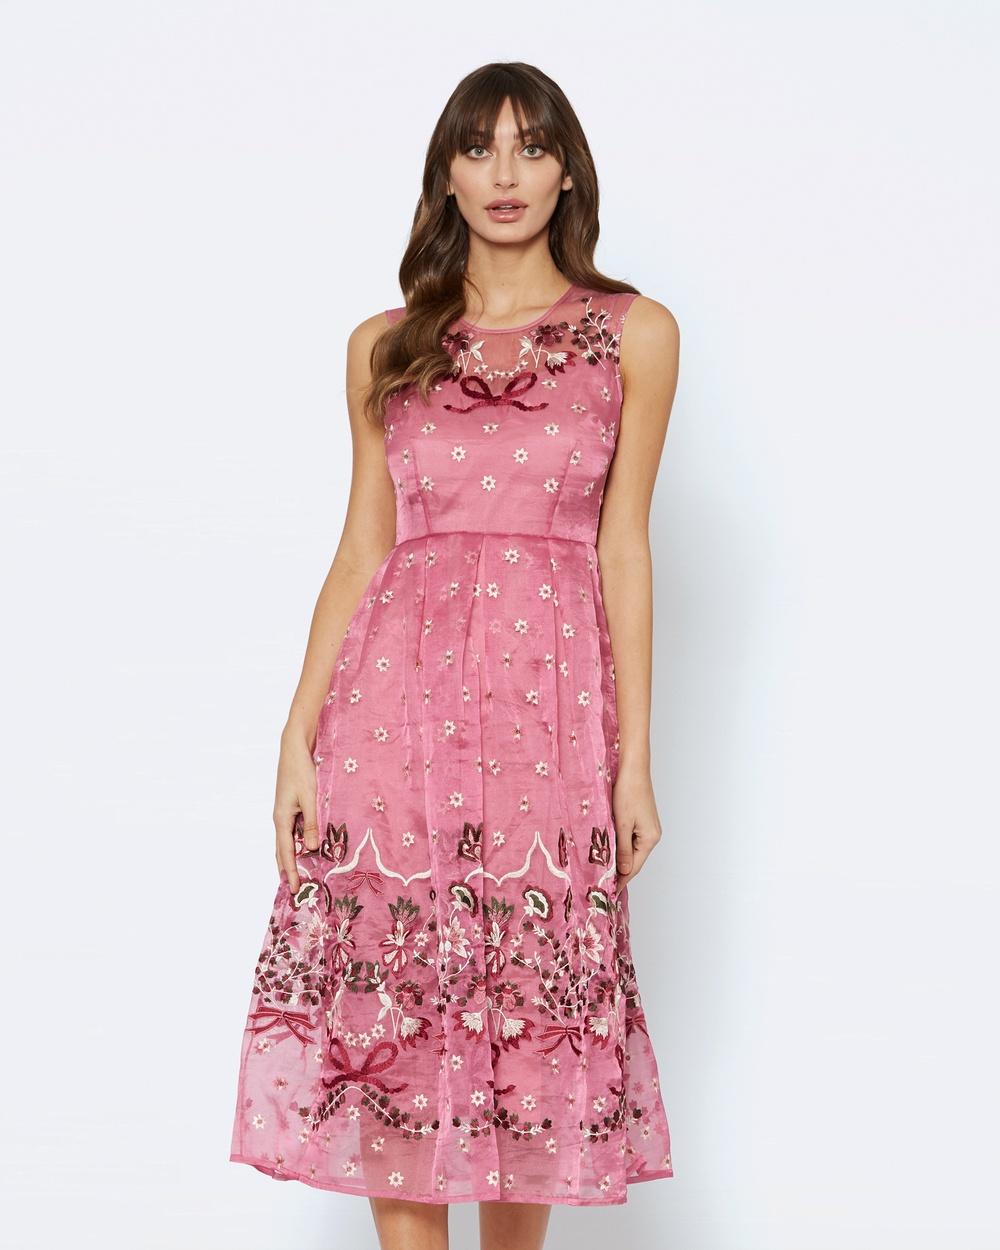 Alannah Hill Flower Paradise Dress Dresses Pink Flower Paradise Dress